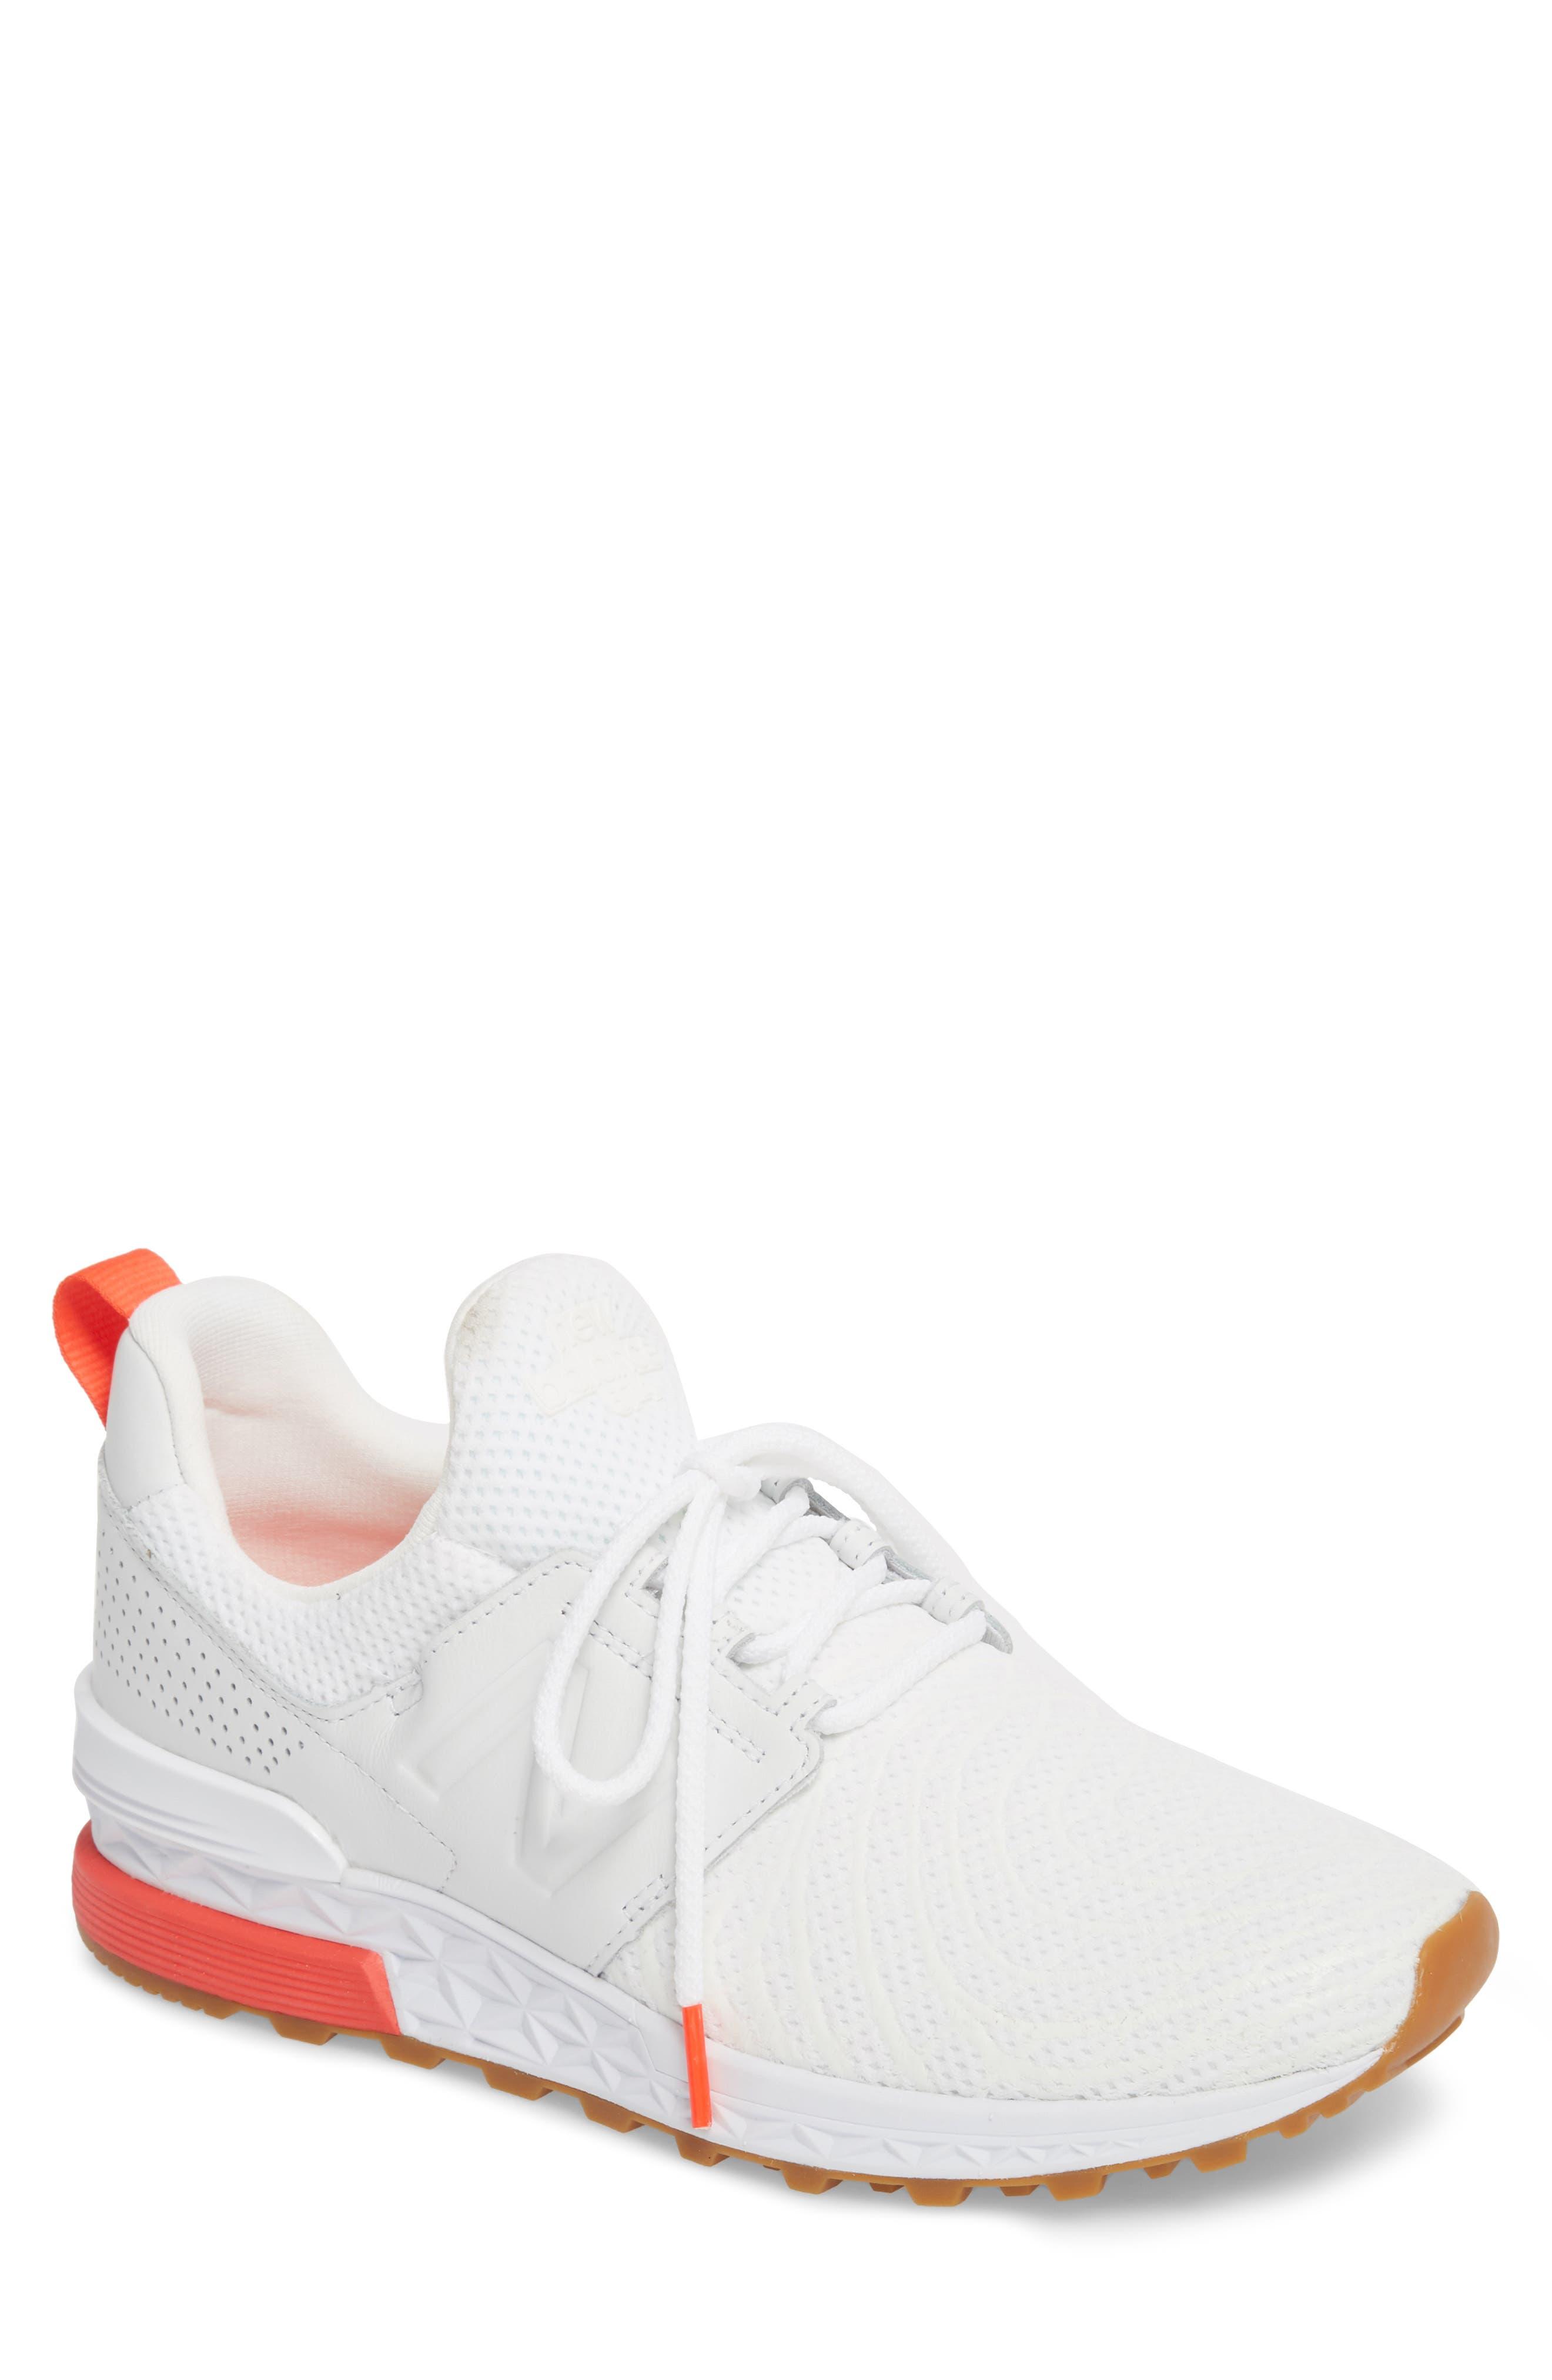 574 Sport Sneaker,                         Main,                         color, 100